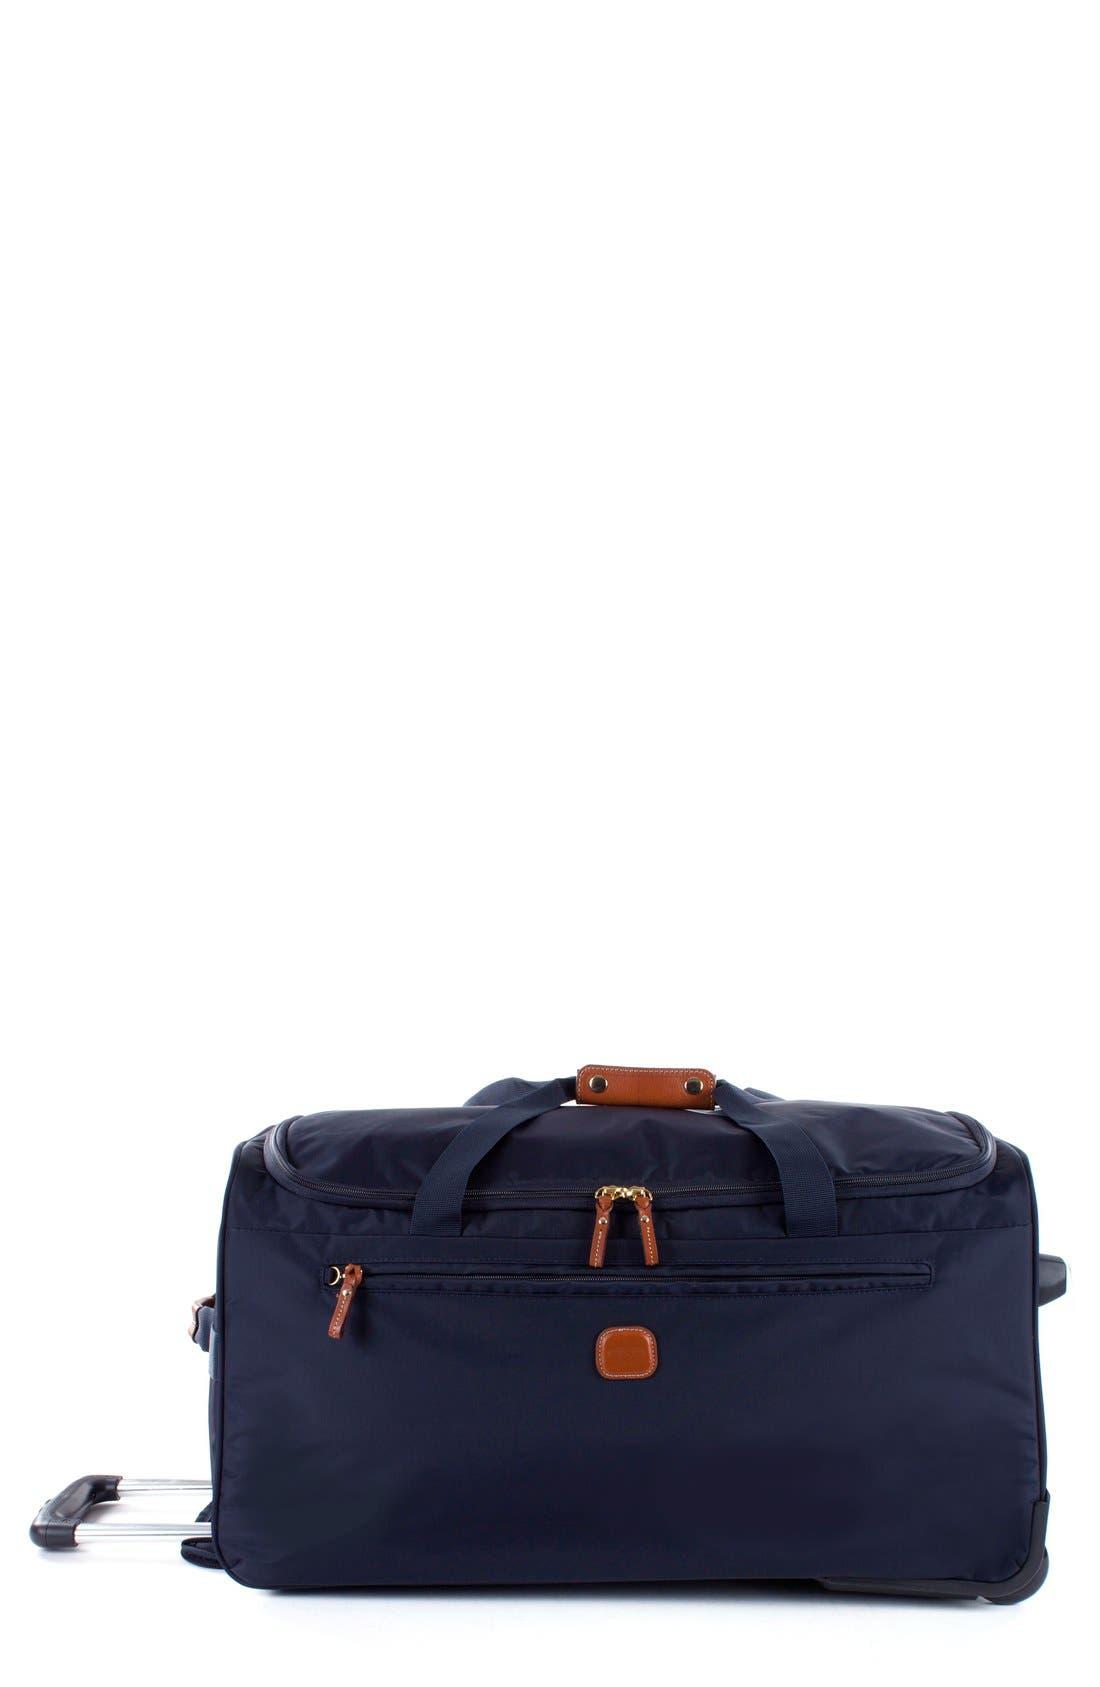 Bric's 'X-Bag' Rolling Duffel Bag (28 Inch)